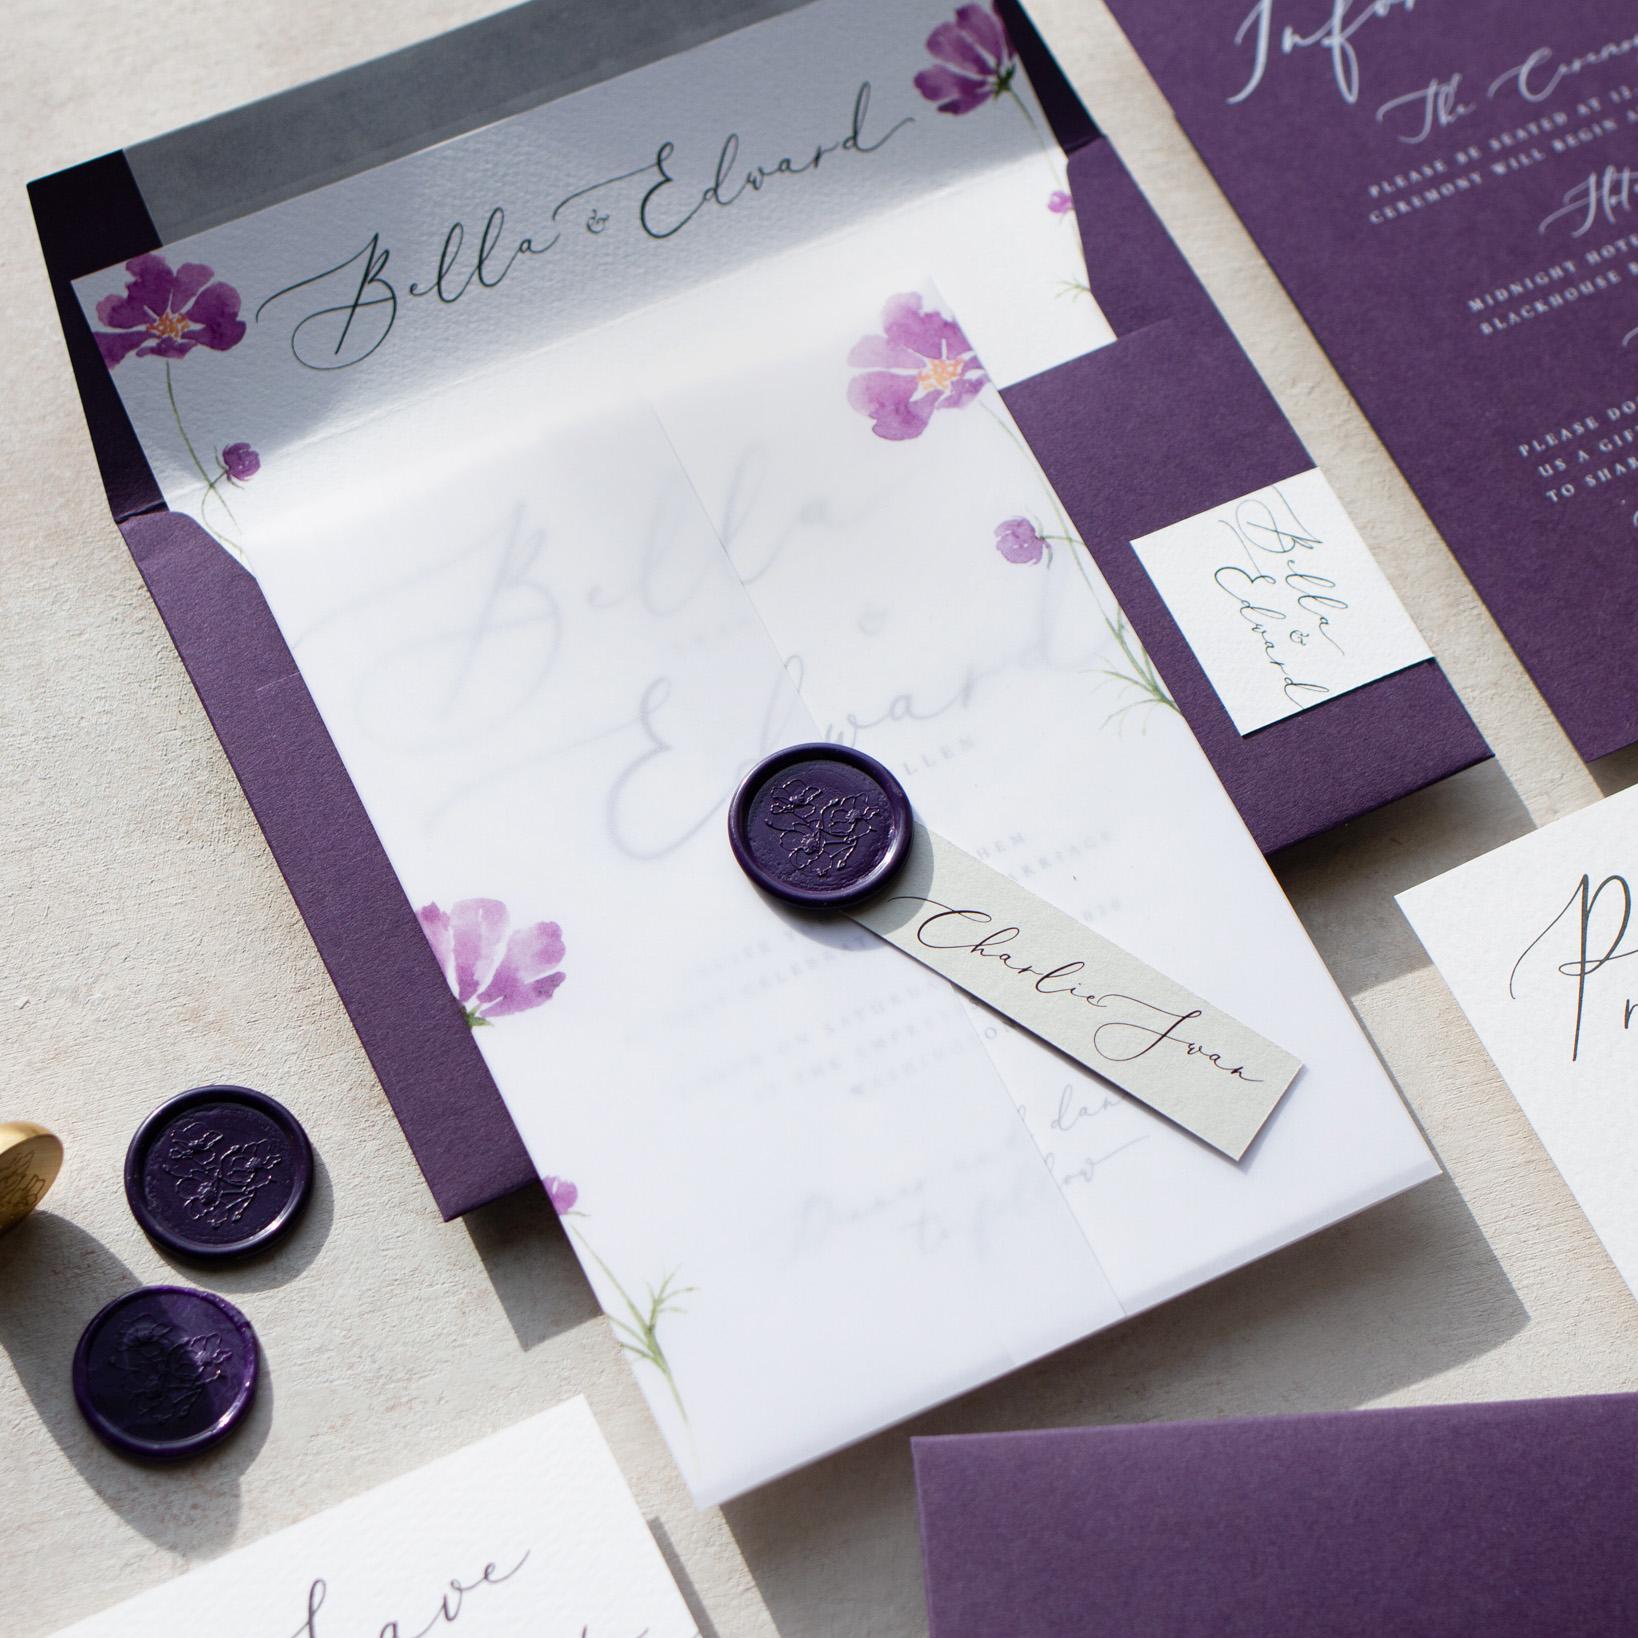 Amethyst Eclipse Purple Wedding Invitation with Vellum Wrap and Wax Seal Details  - www.pinglepie.com.jpg